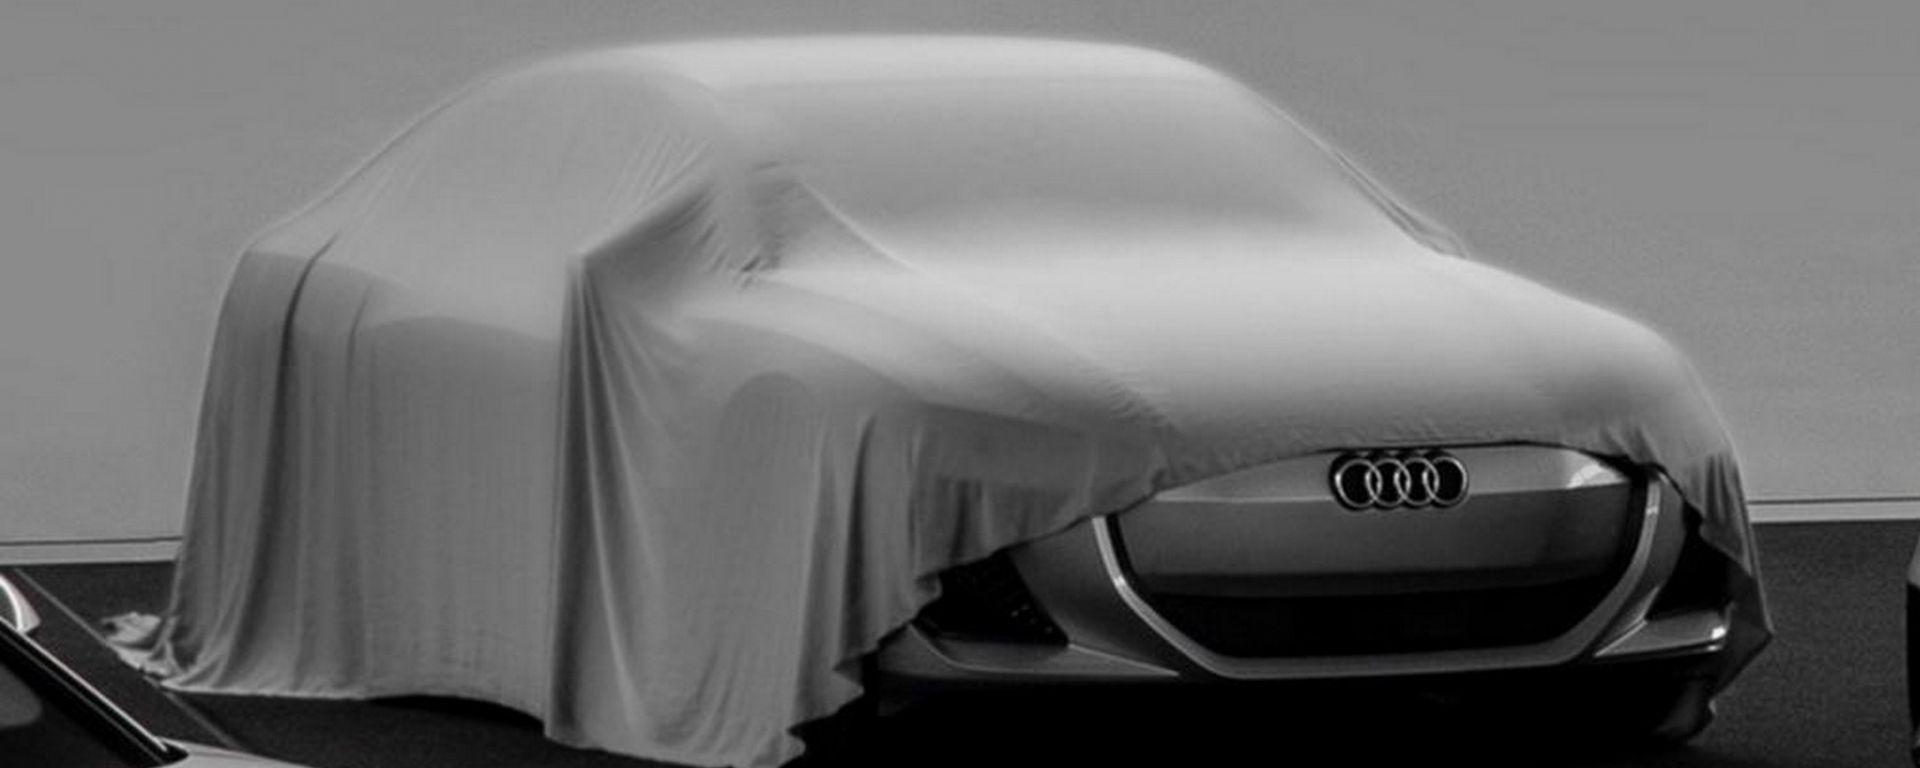 Audi concept car elettrica